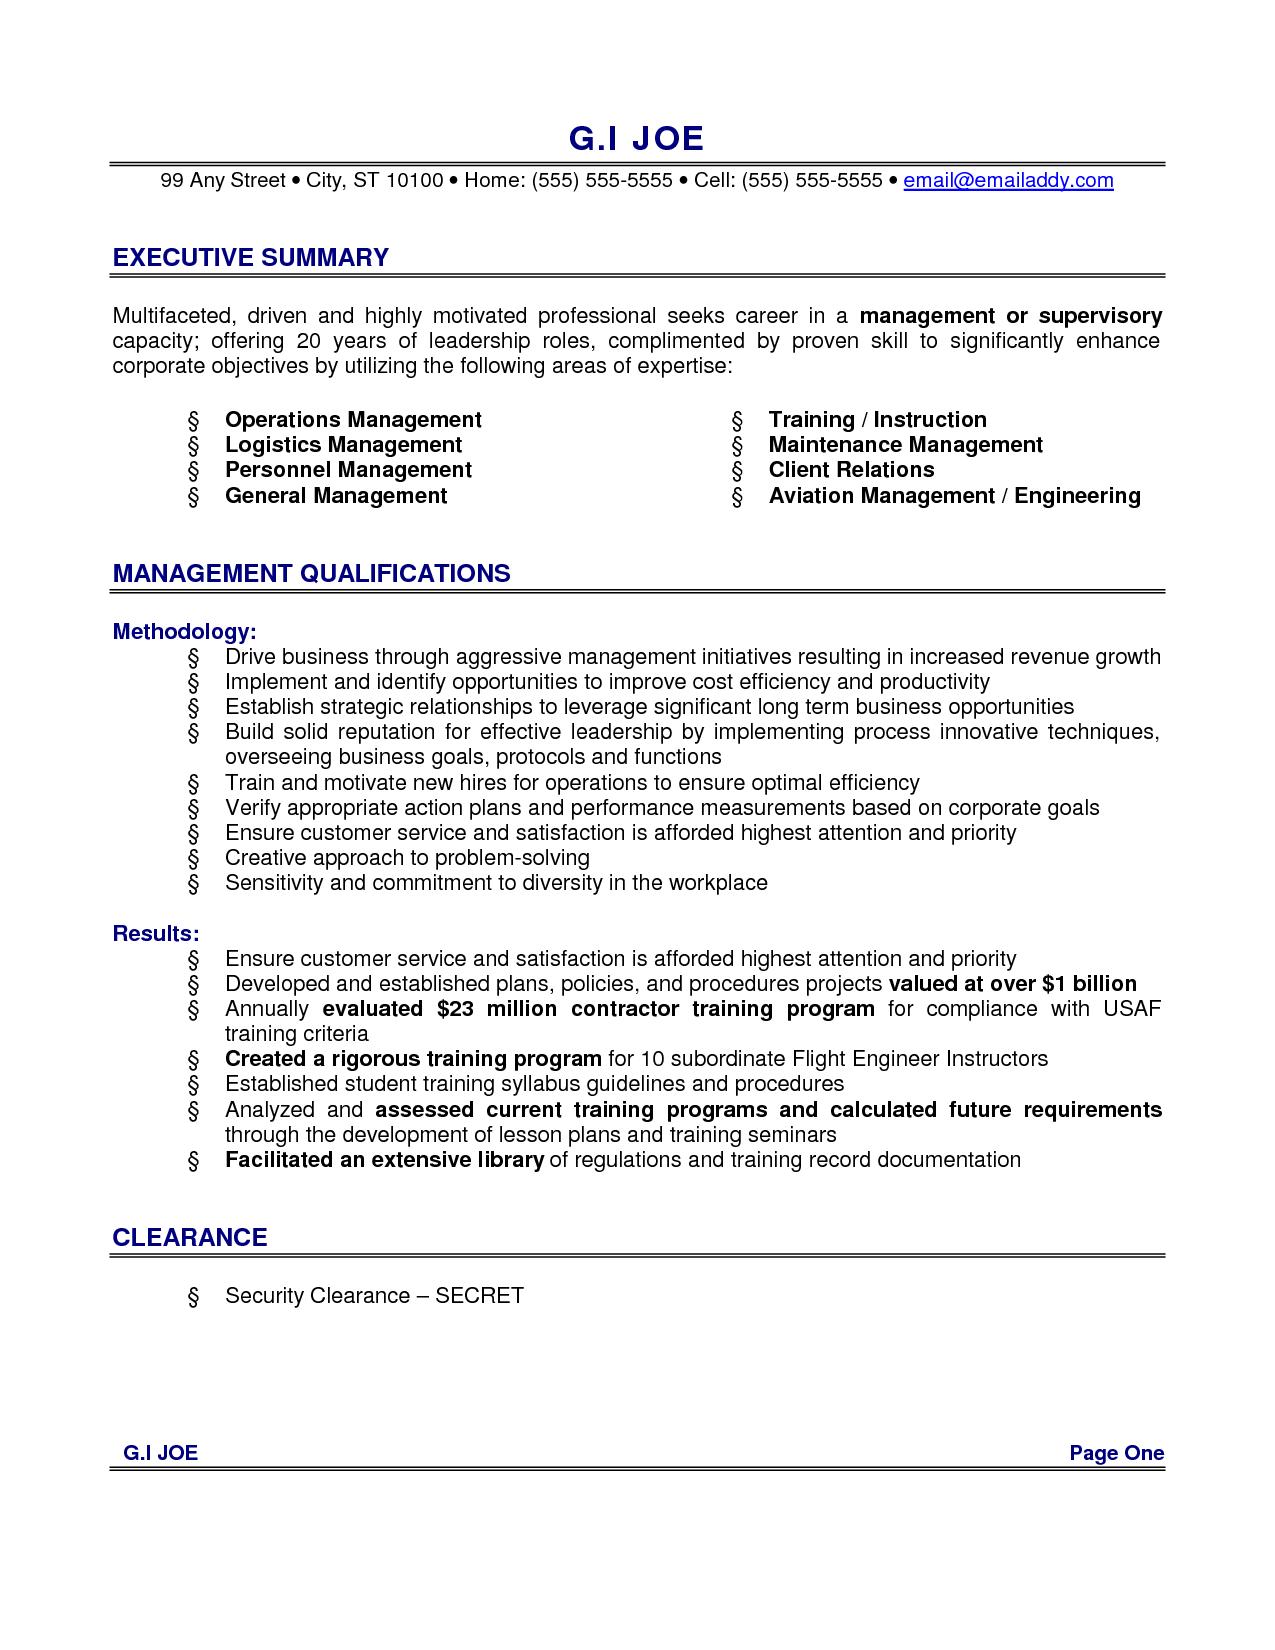 Executive Summary Resume Sample - Resume Sample